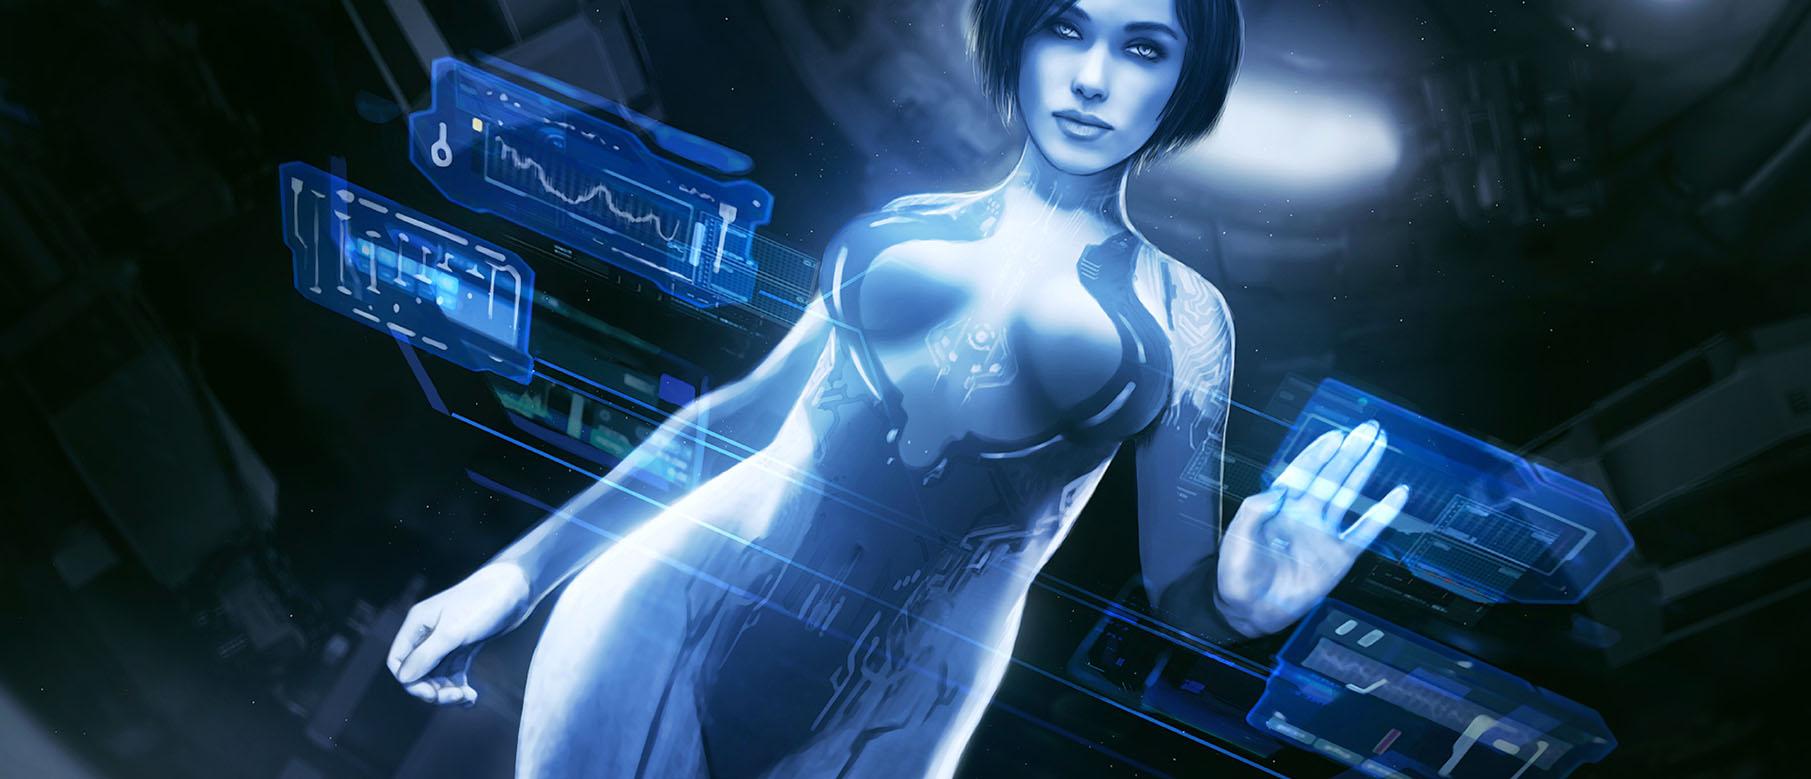 Halo 2 cortana nude adult gallery